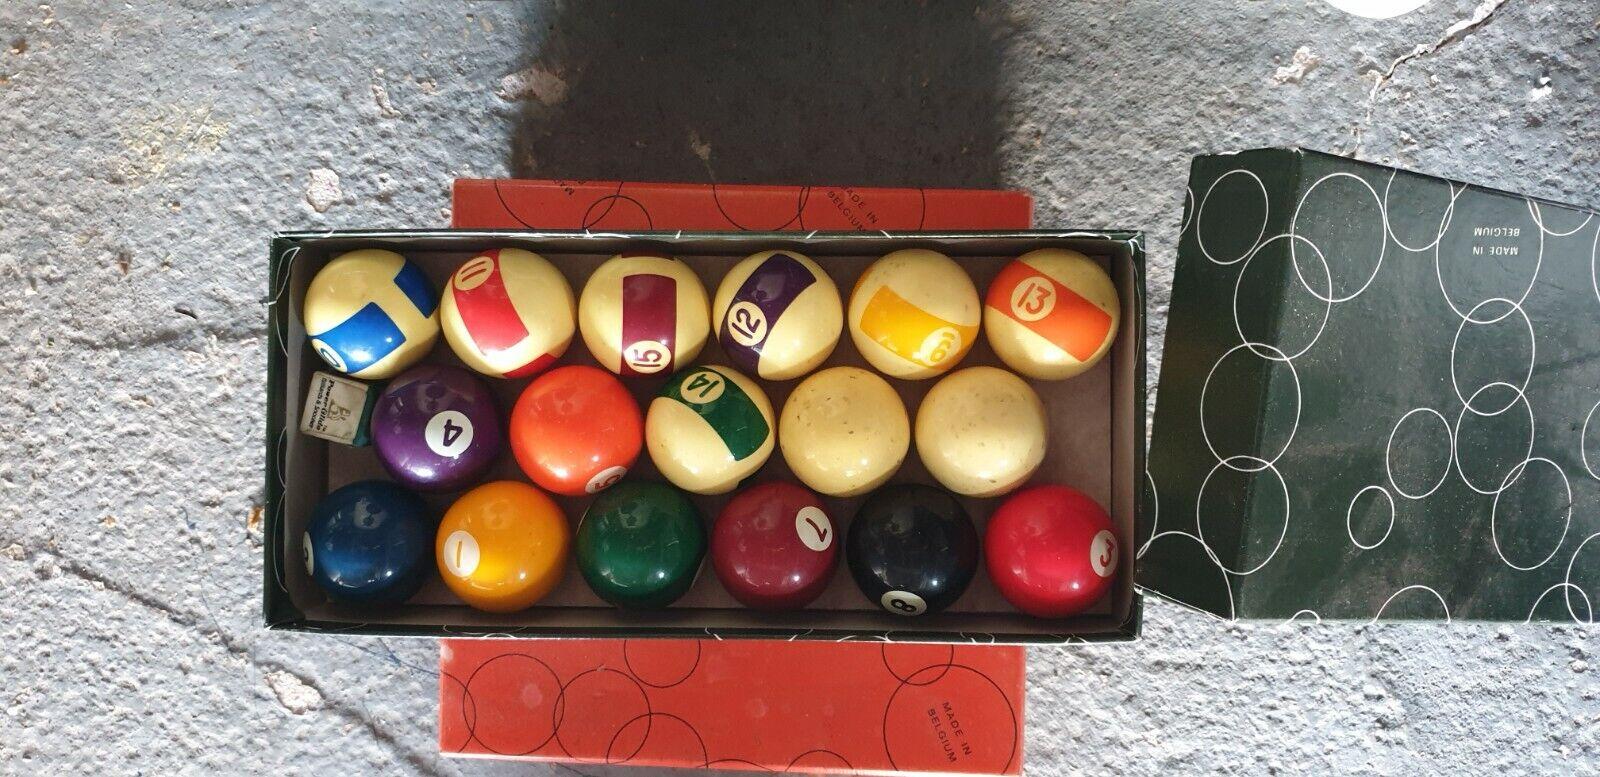 snooker and pool balls 1 7/8